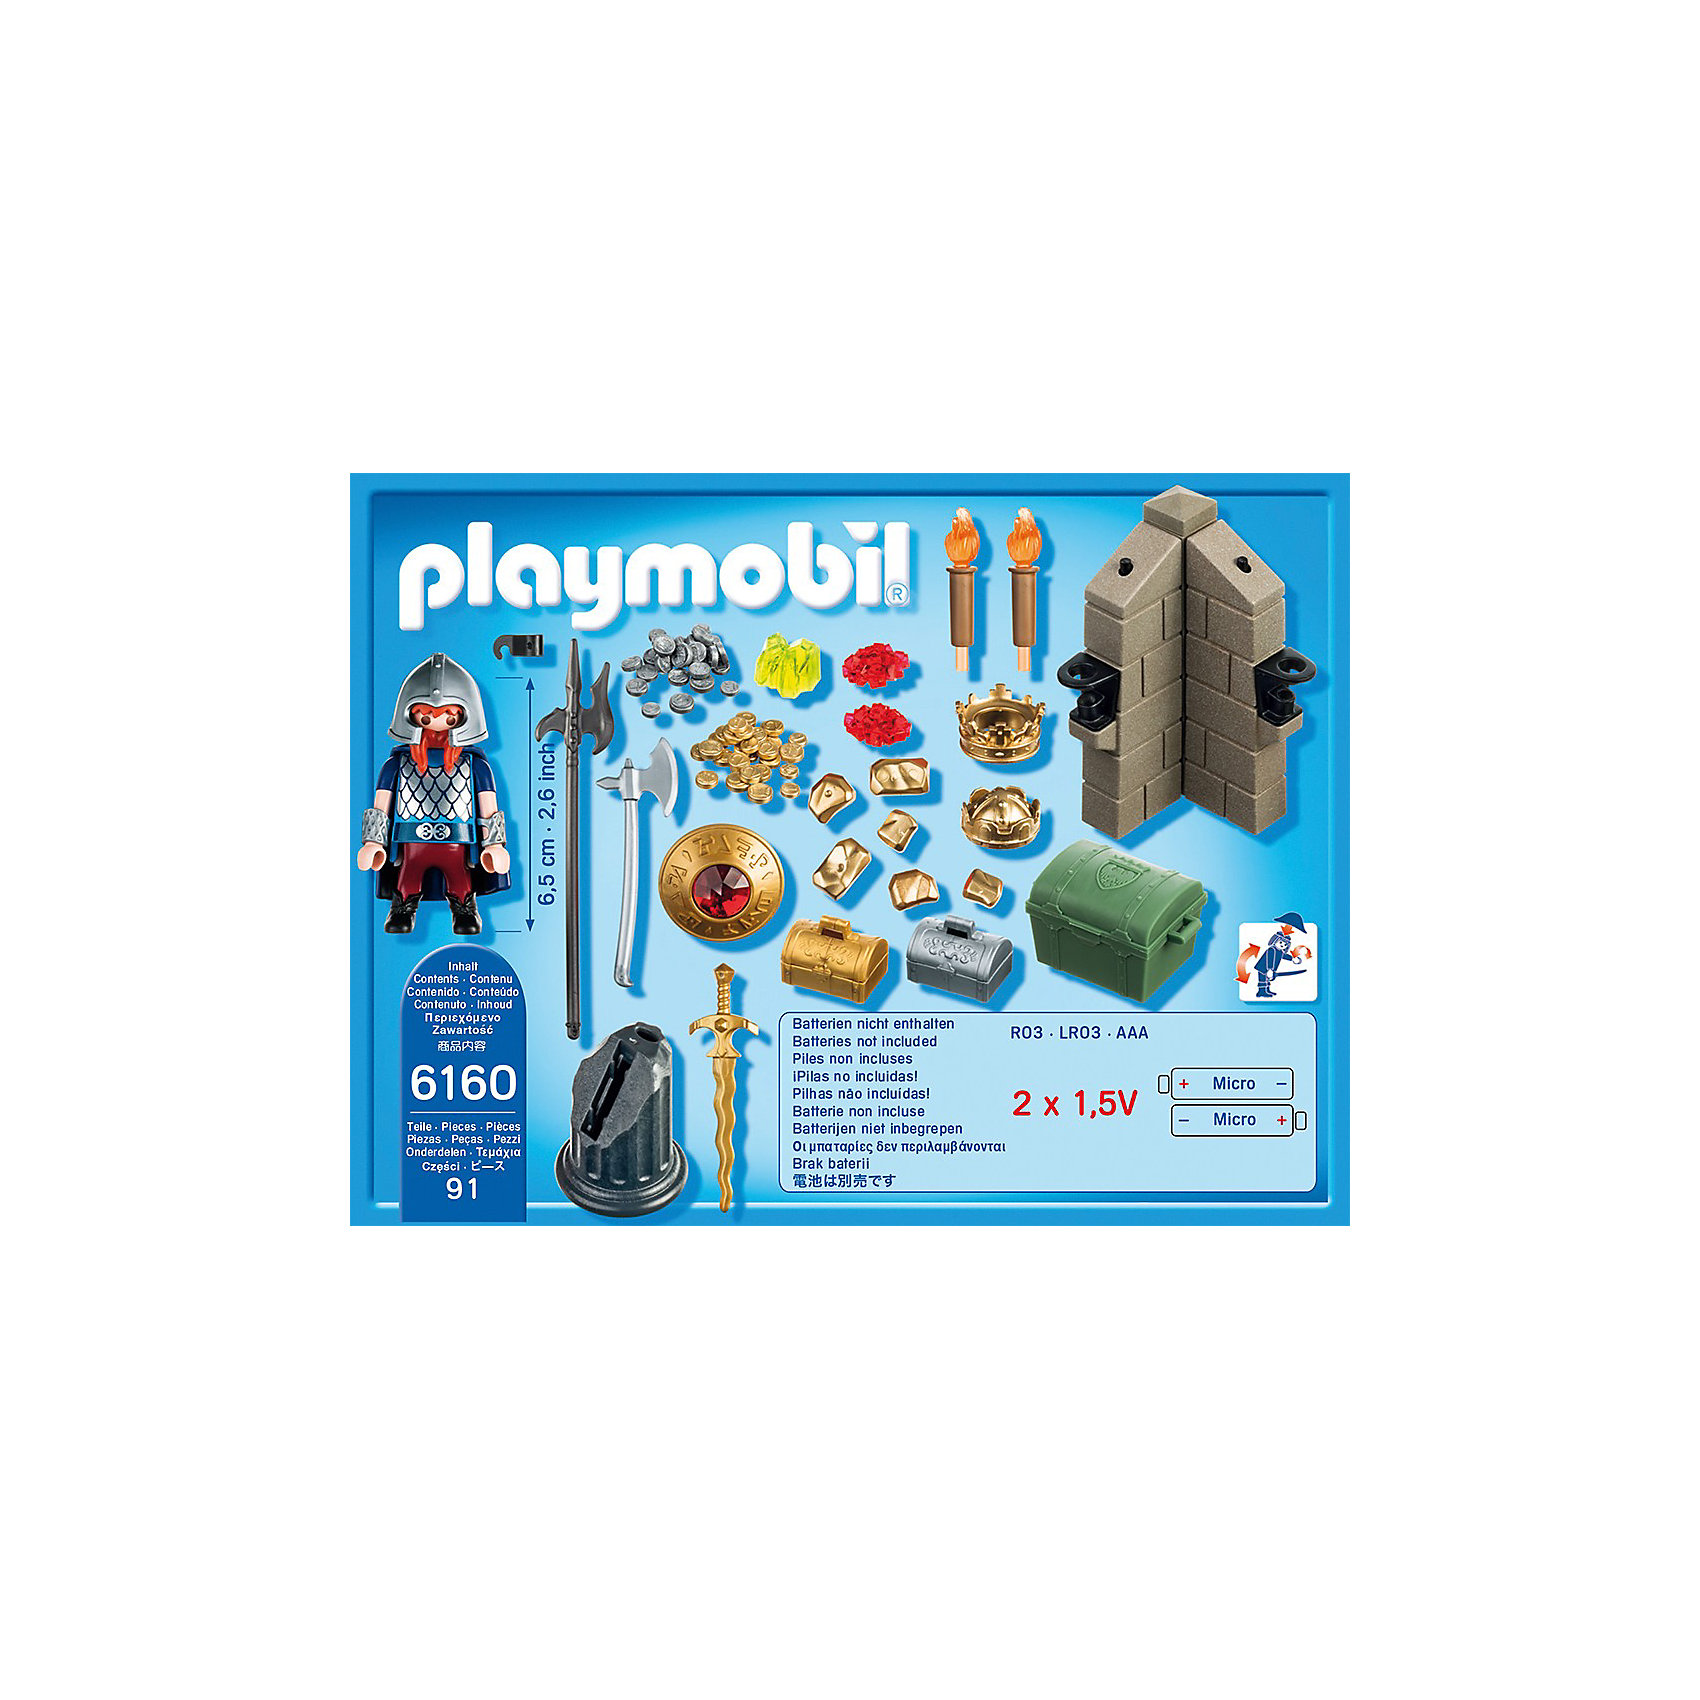 PLAYMOBIL 6160 ������: ��������� ������� �������� (PLAYMOBIL�)